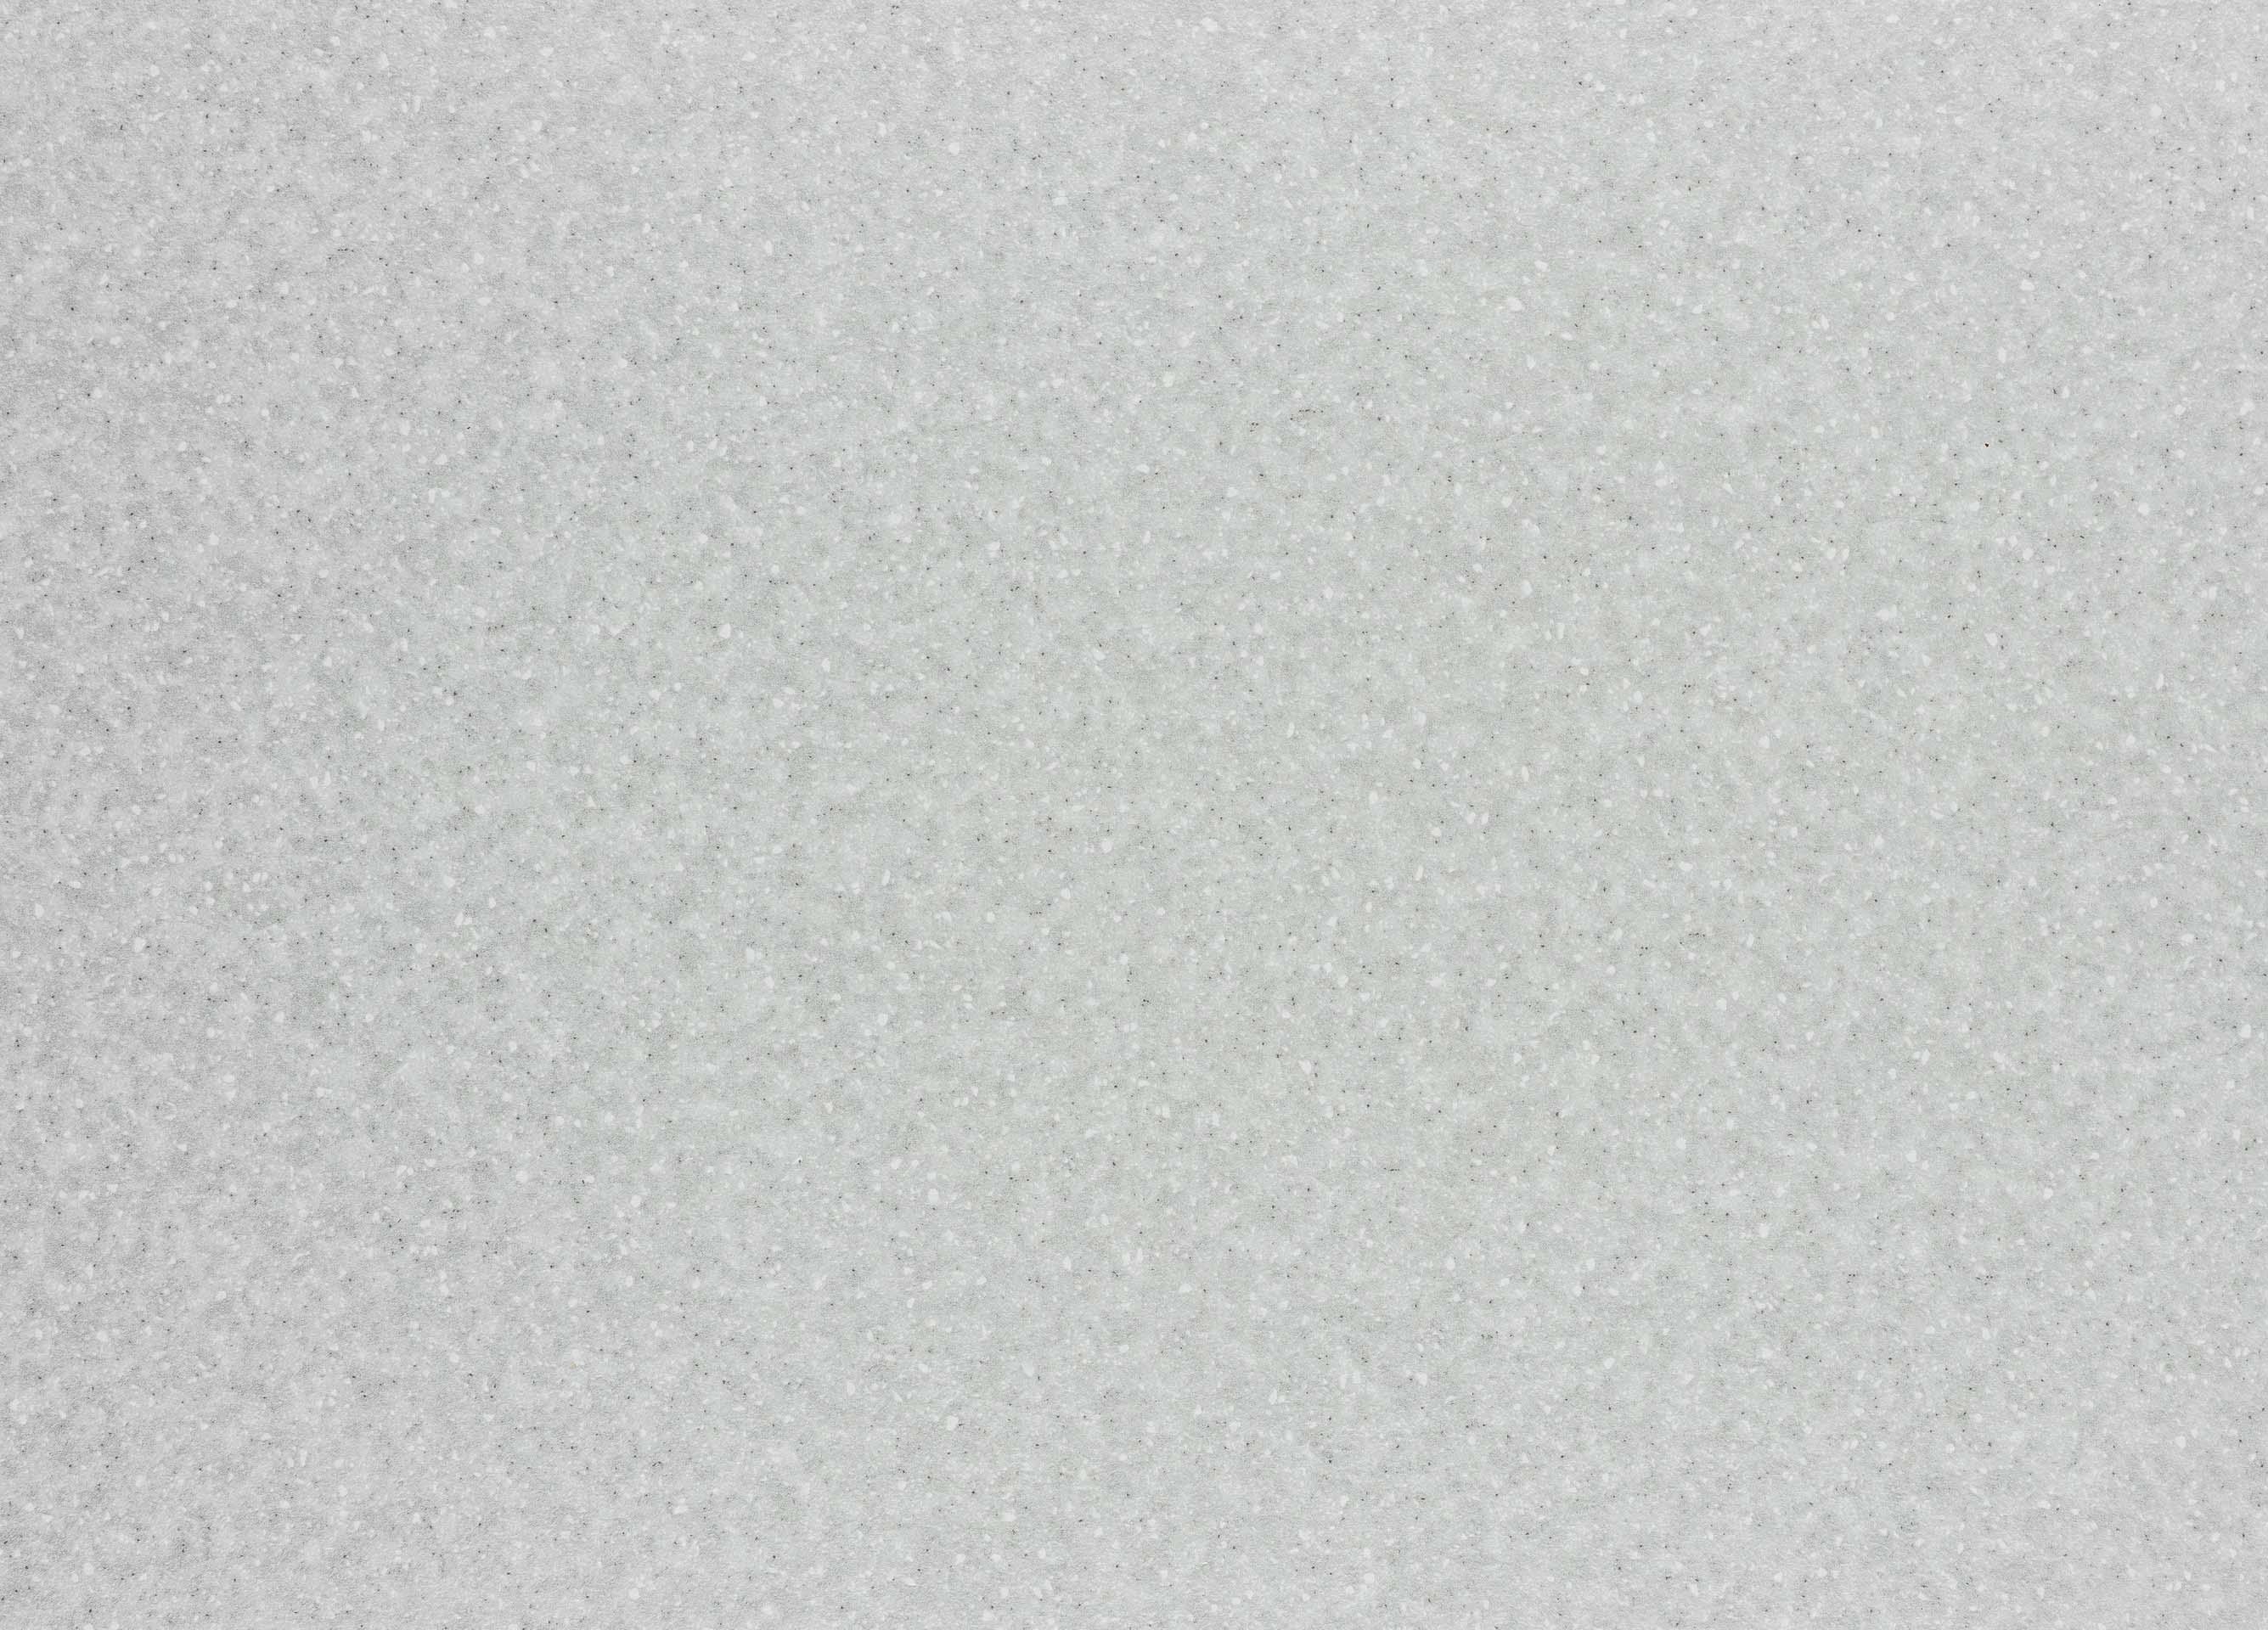 Столешница № 155Л Берилл / 26 мм